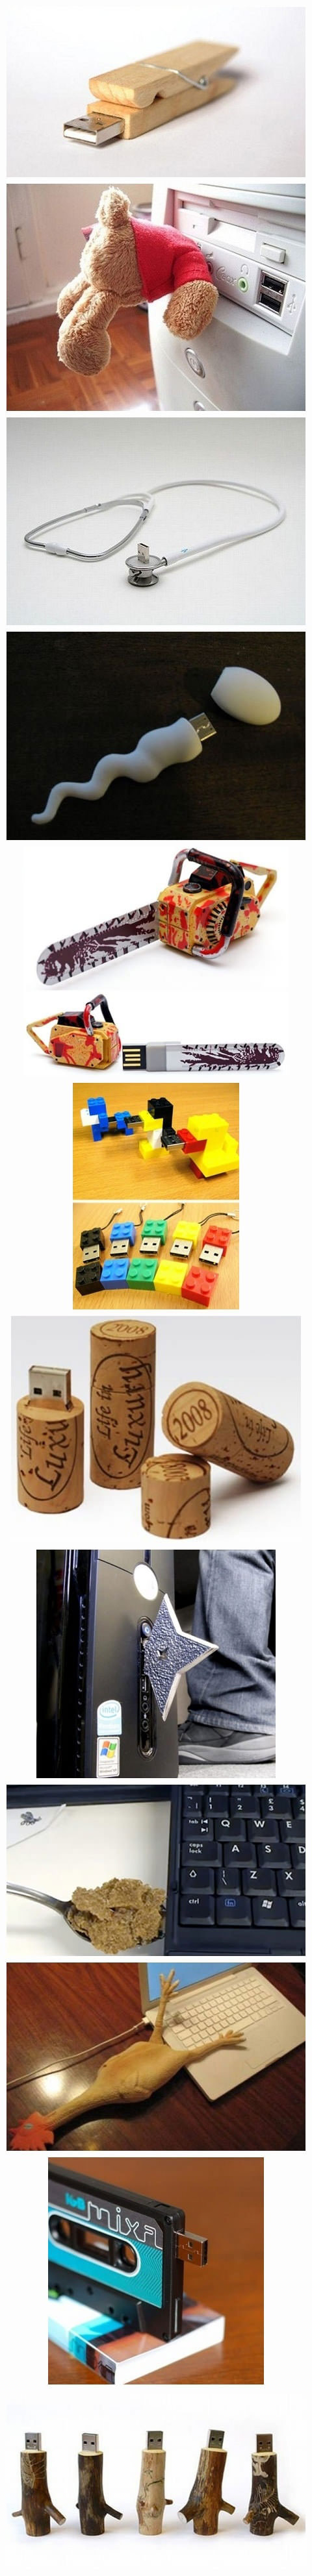 Creative USB flash drives